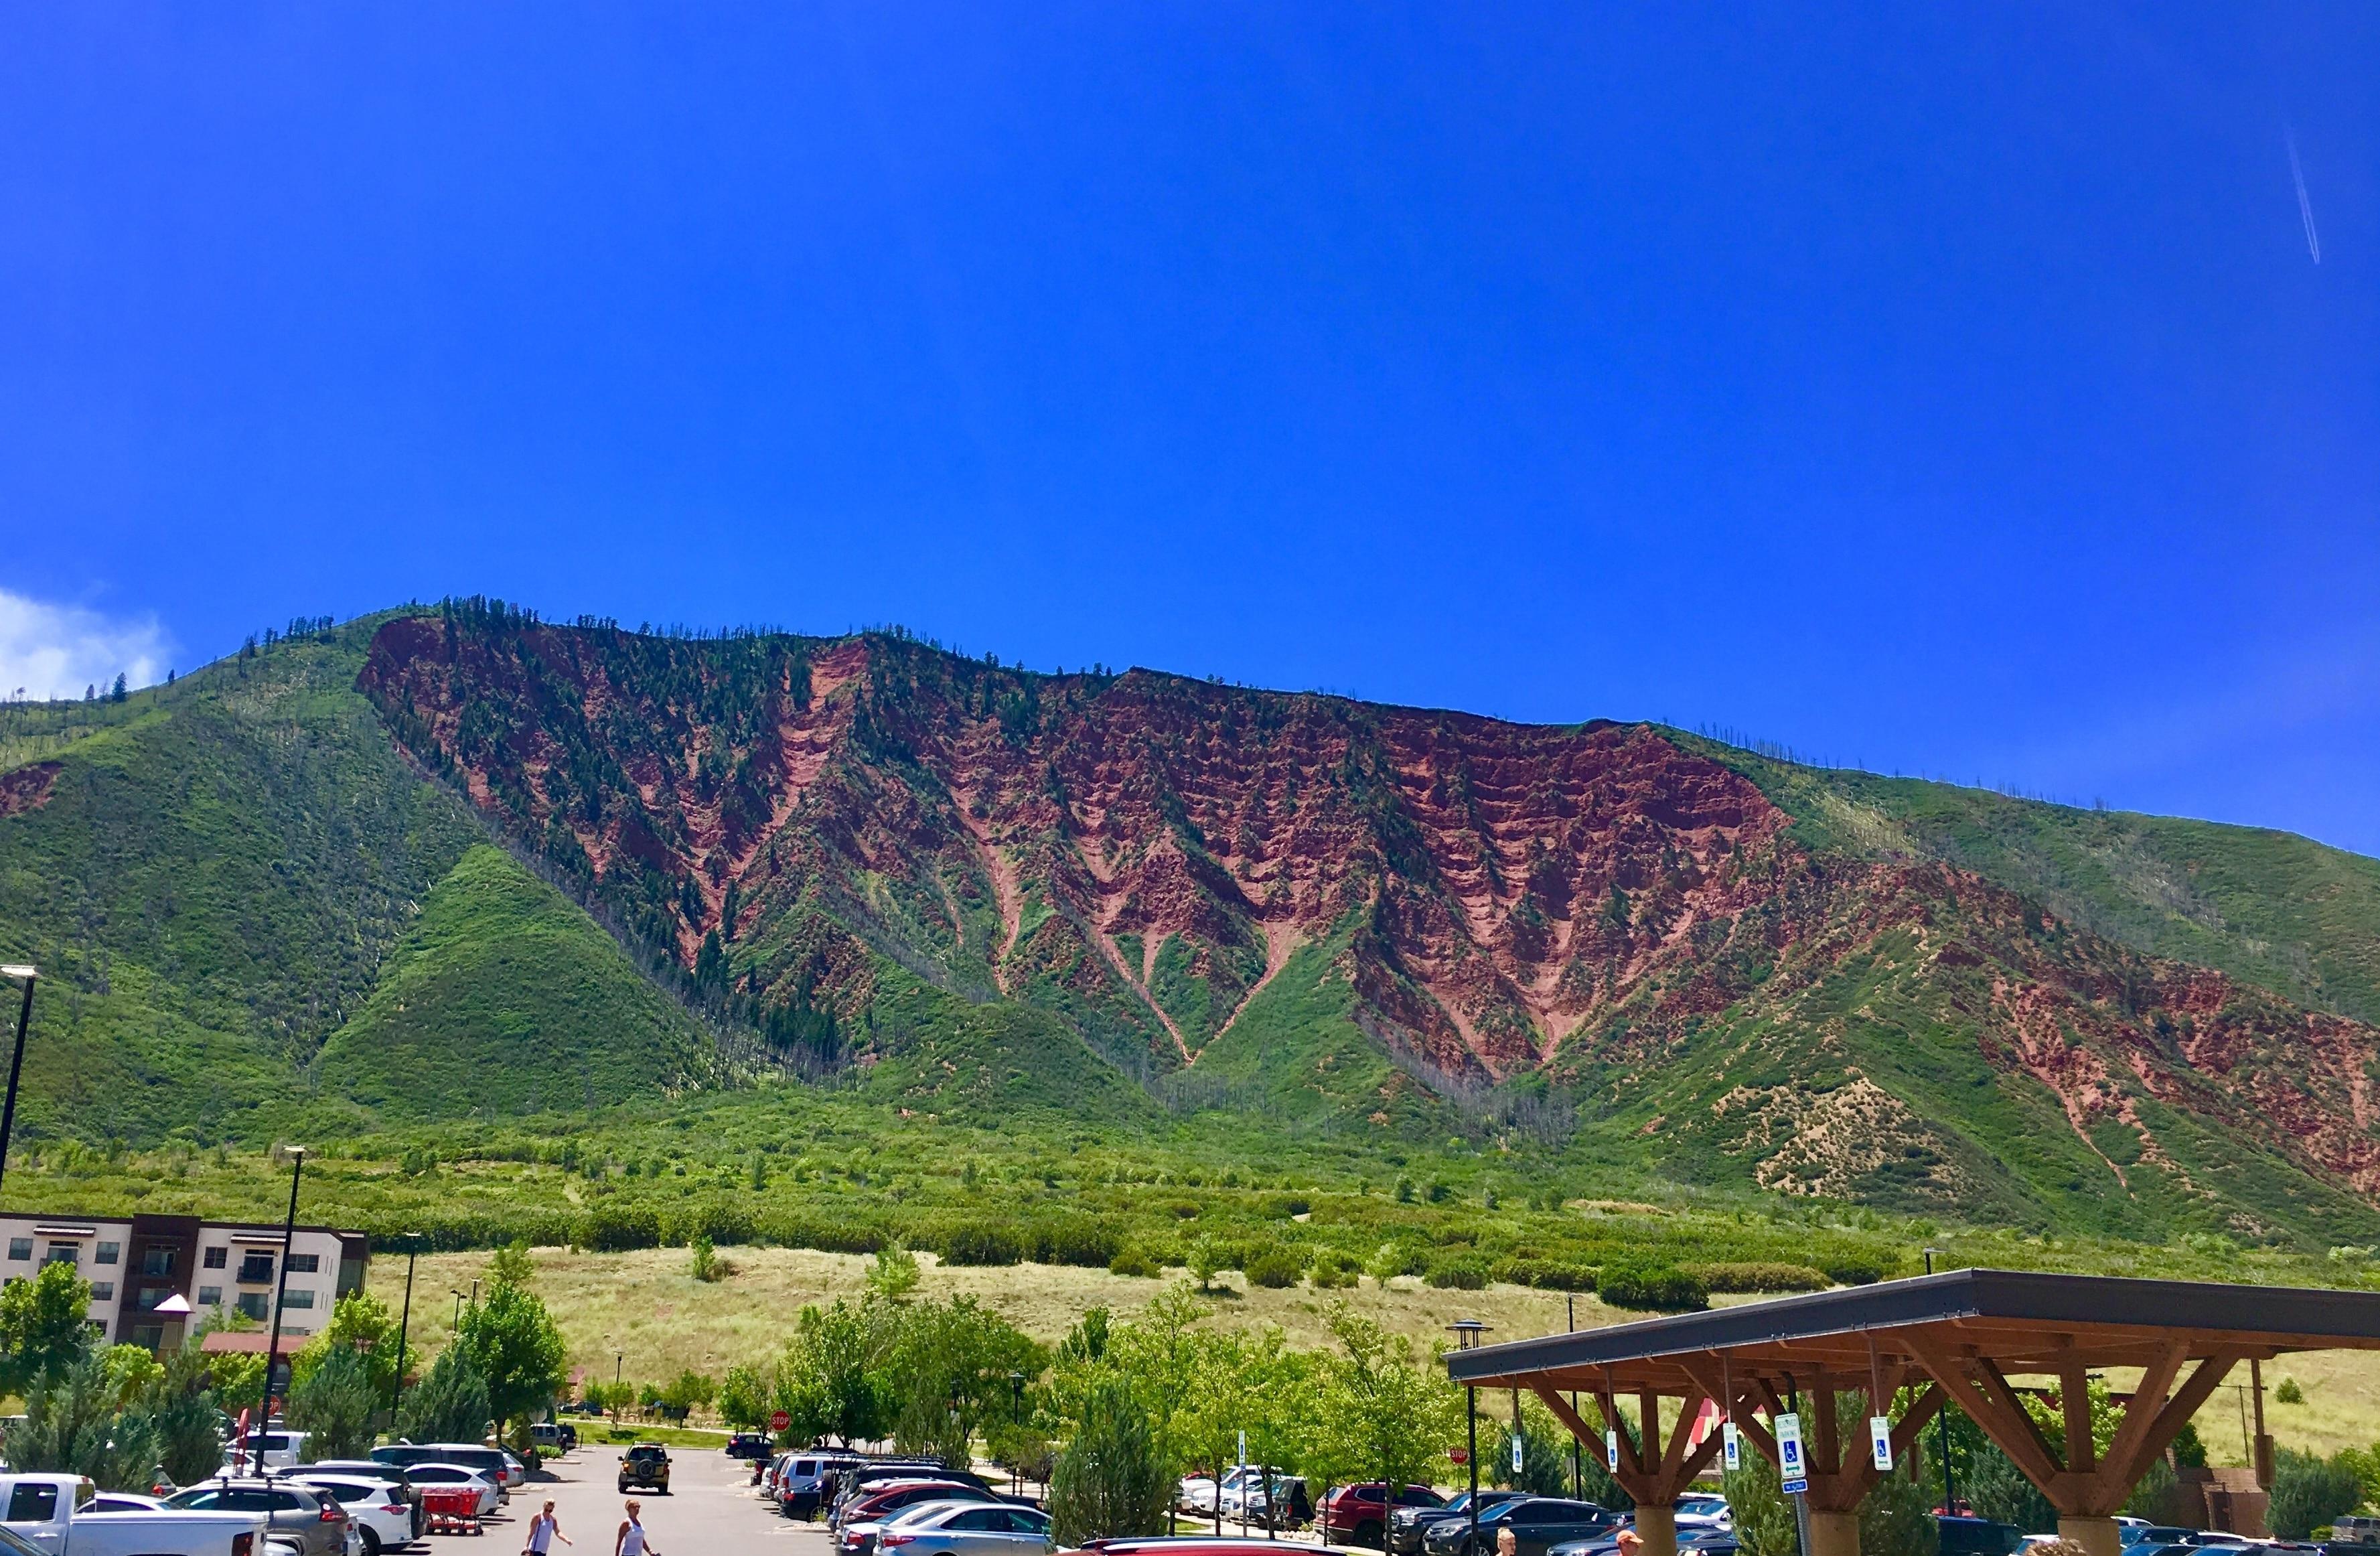 Glenwood Springs, Colorado, United States of America